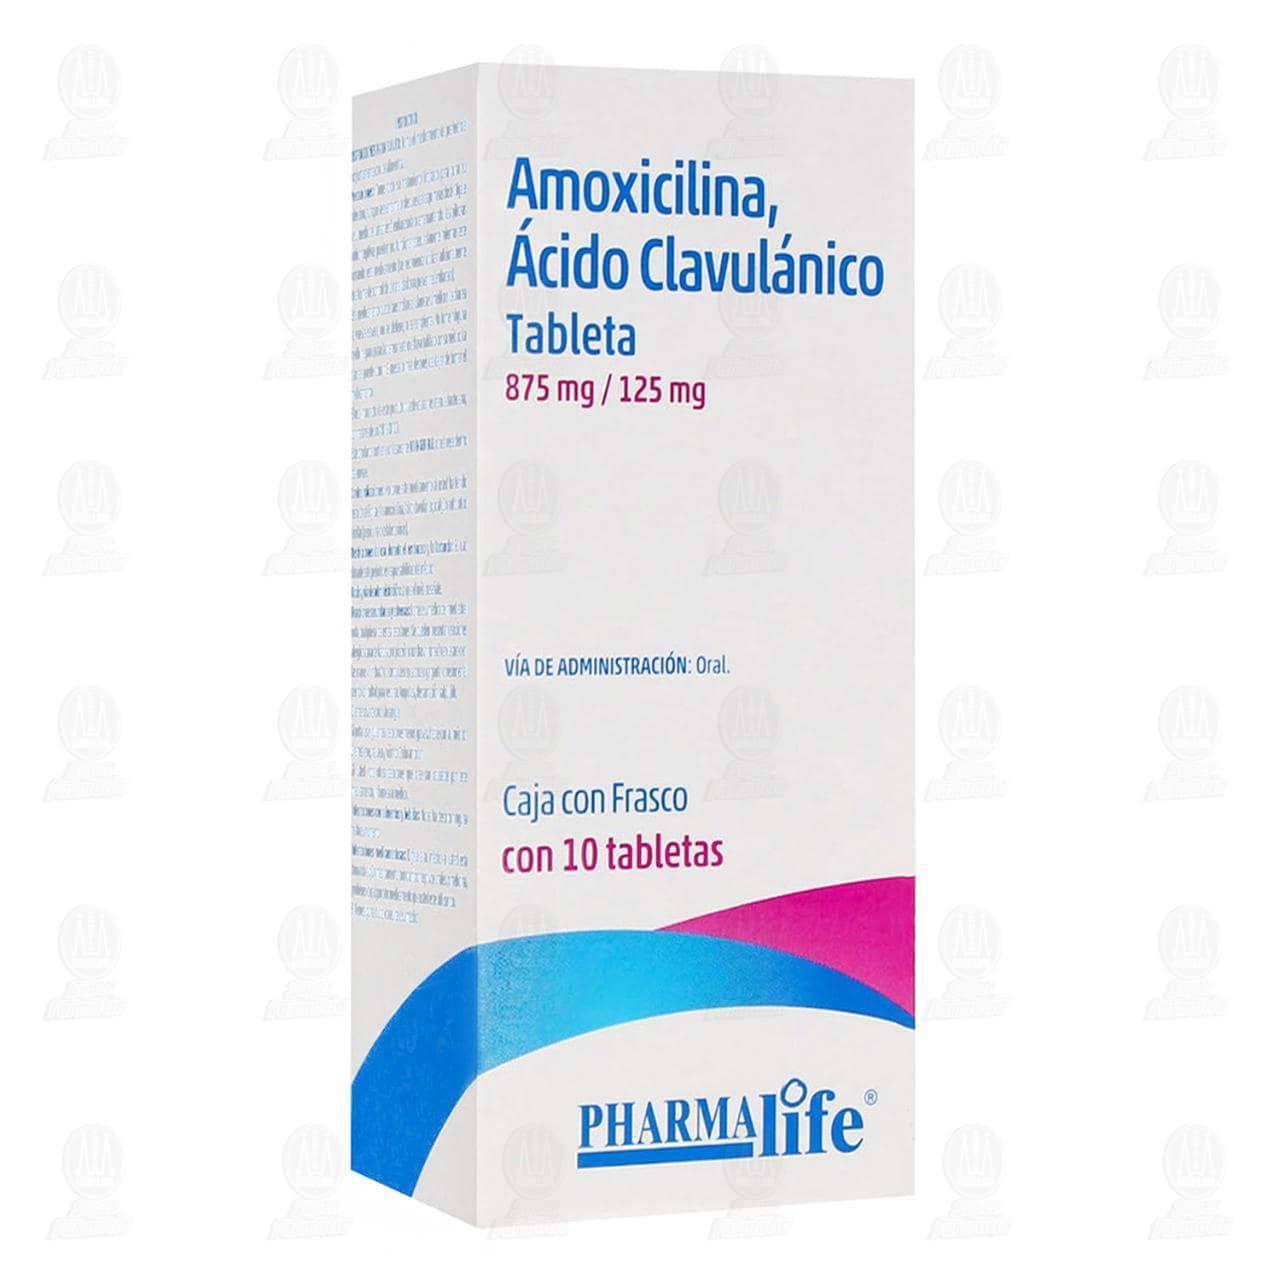 Comprar Amoxicilina, Ácido Clavulánico 875mg/125mg 10 Tabletas Pharmalife en Farmacias Guadalajara